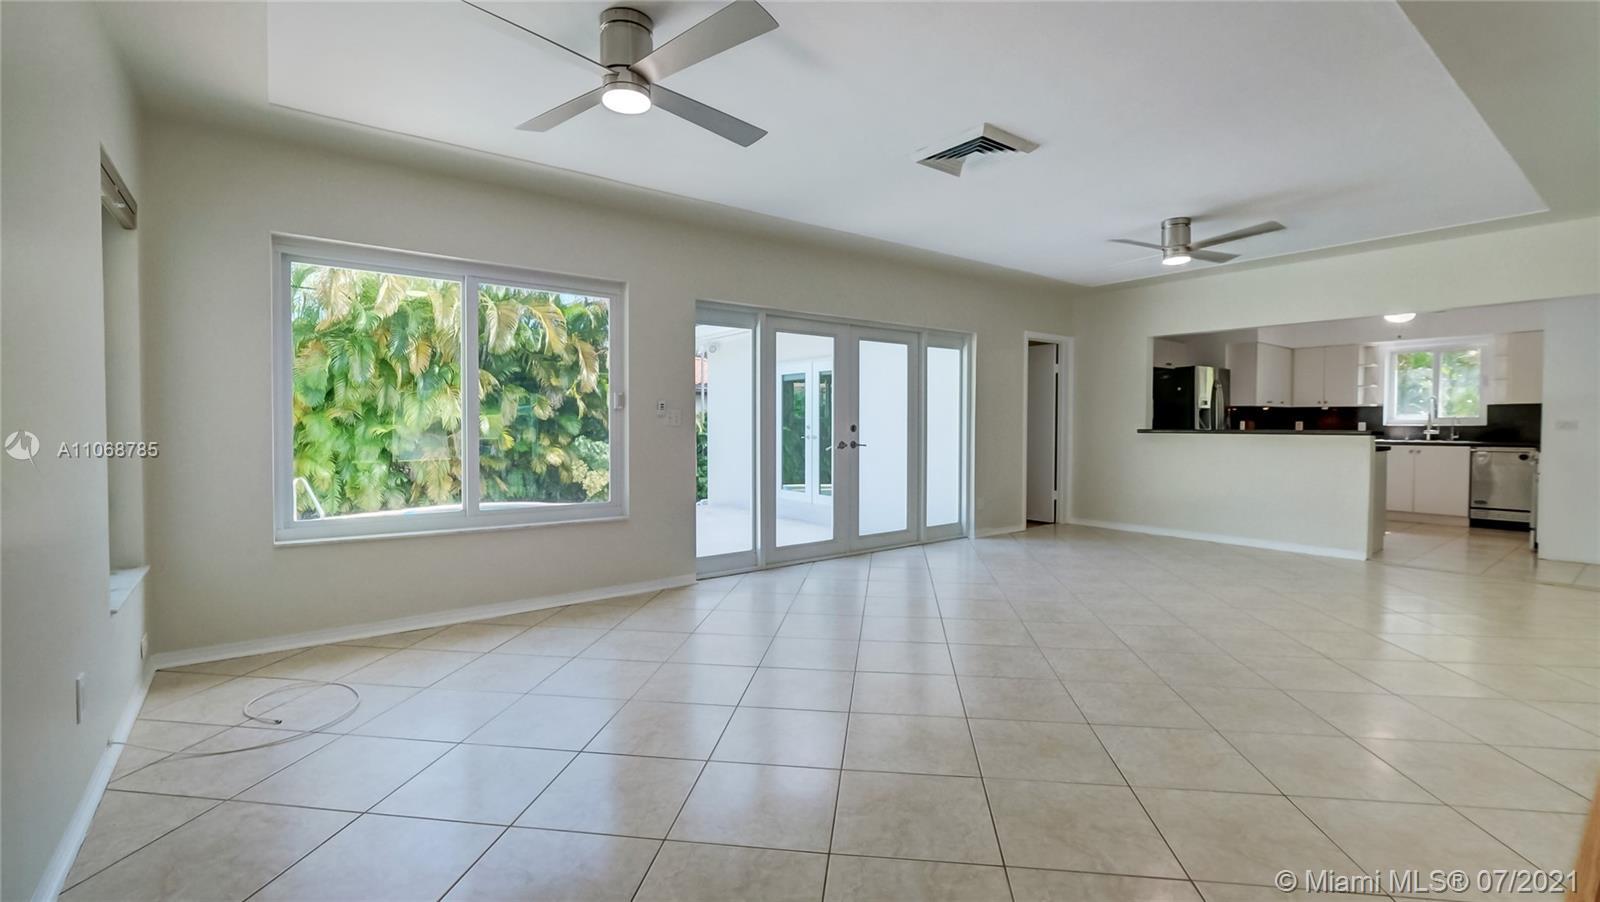 Miami Shores # - 09 - photo